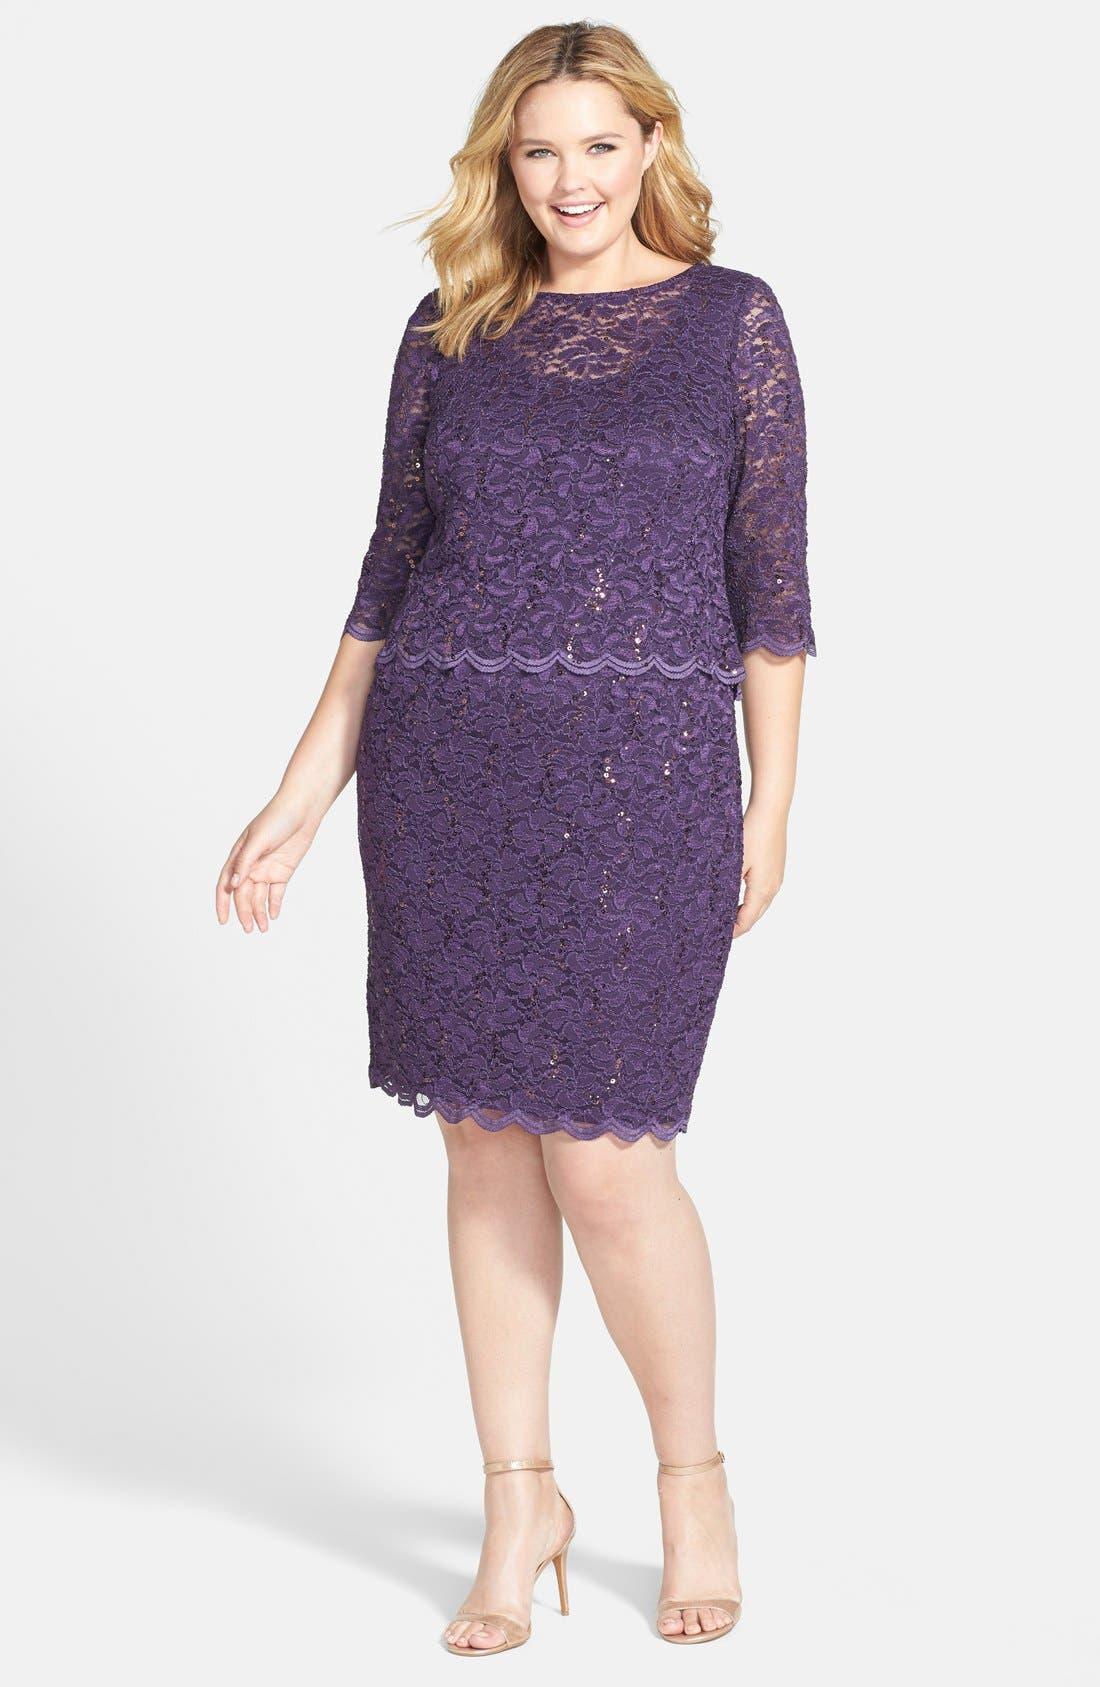 Alternate Image 1 Selected - Alex Evenings Embellished Lace Sheath Dress (Plus Size)